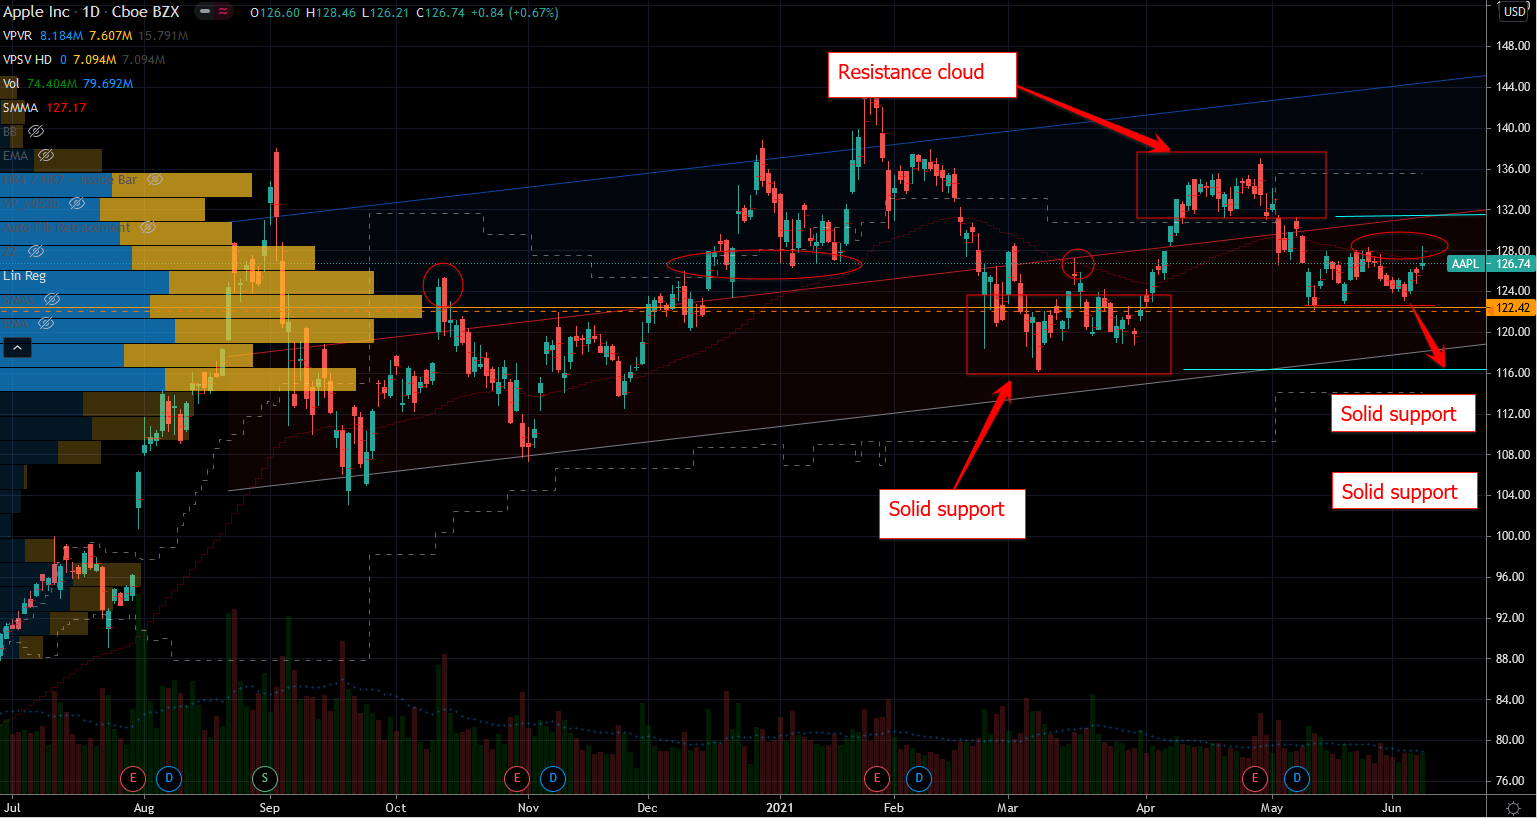 Apple (AAPL) Stock Chart Showing Set Range